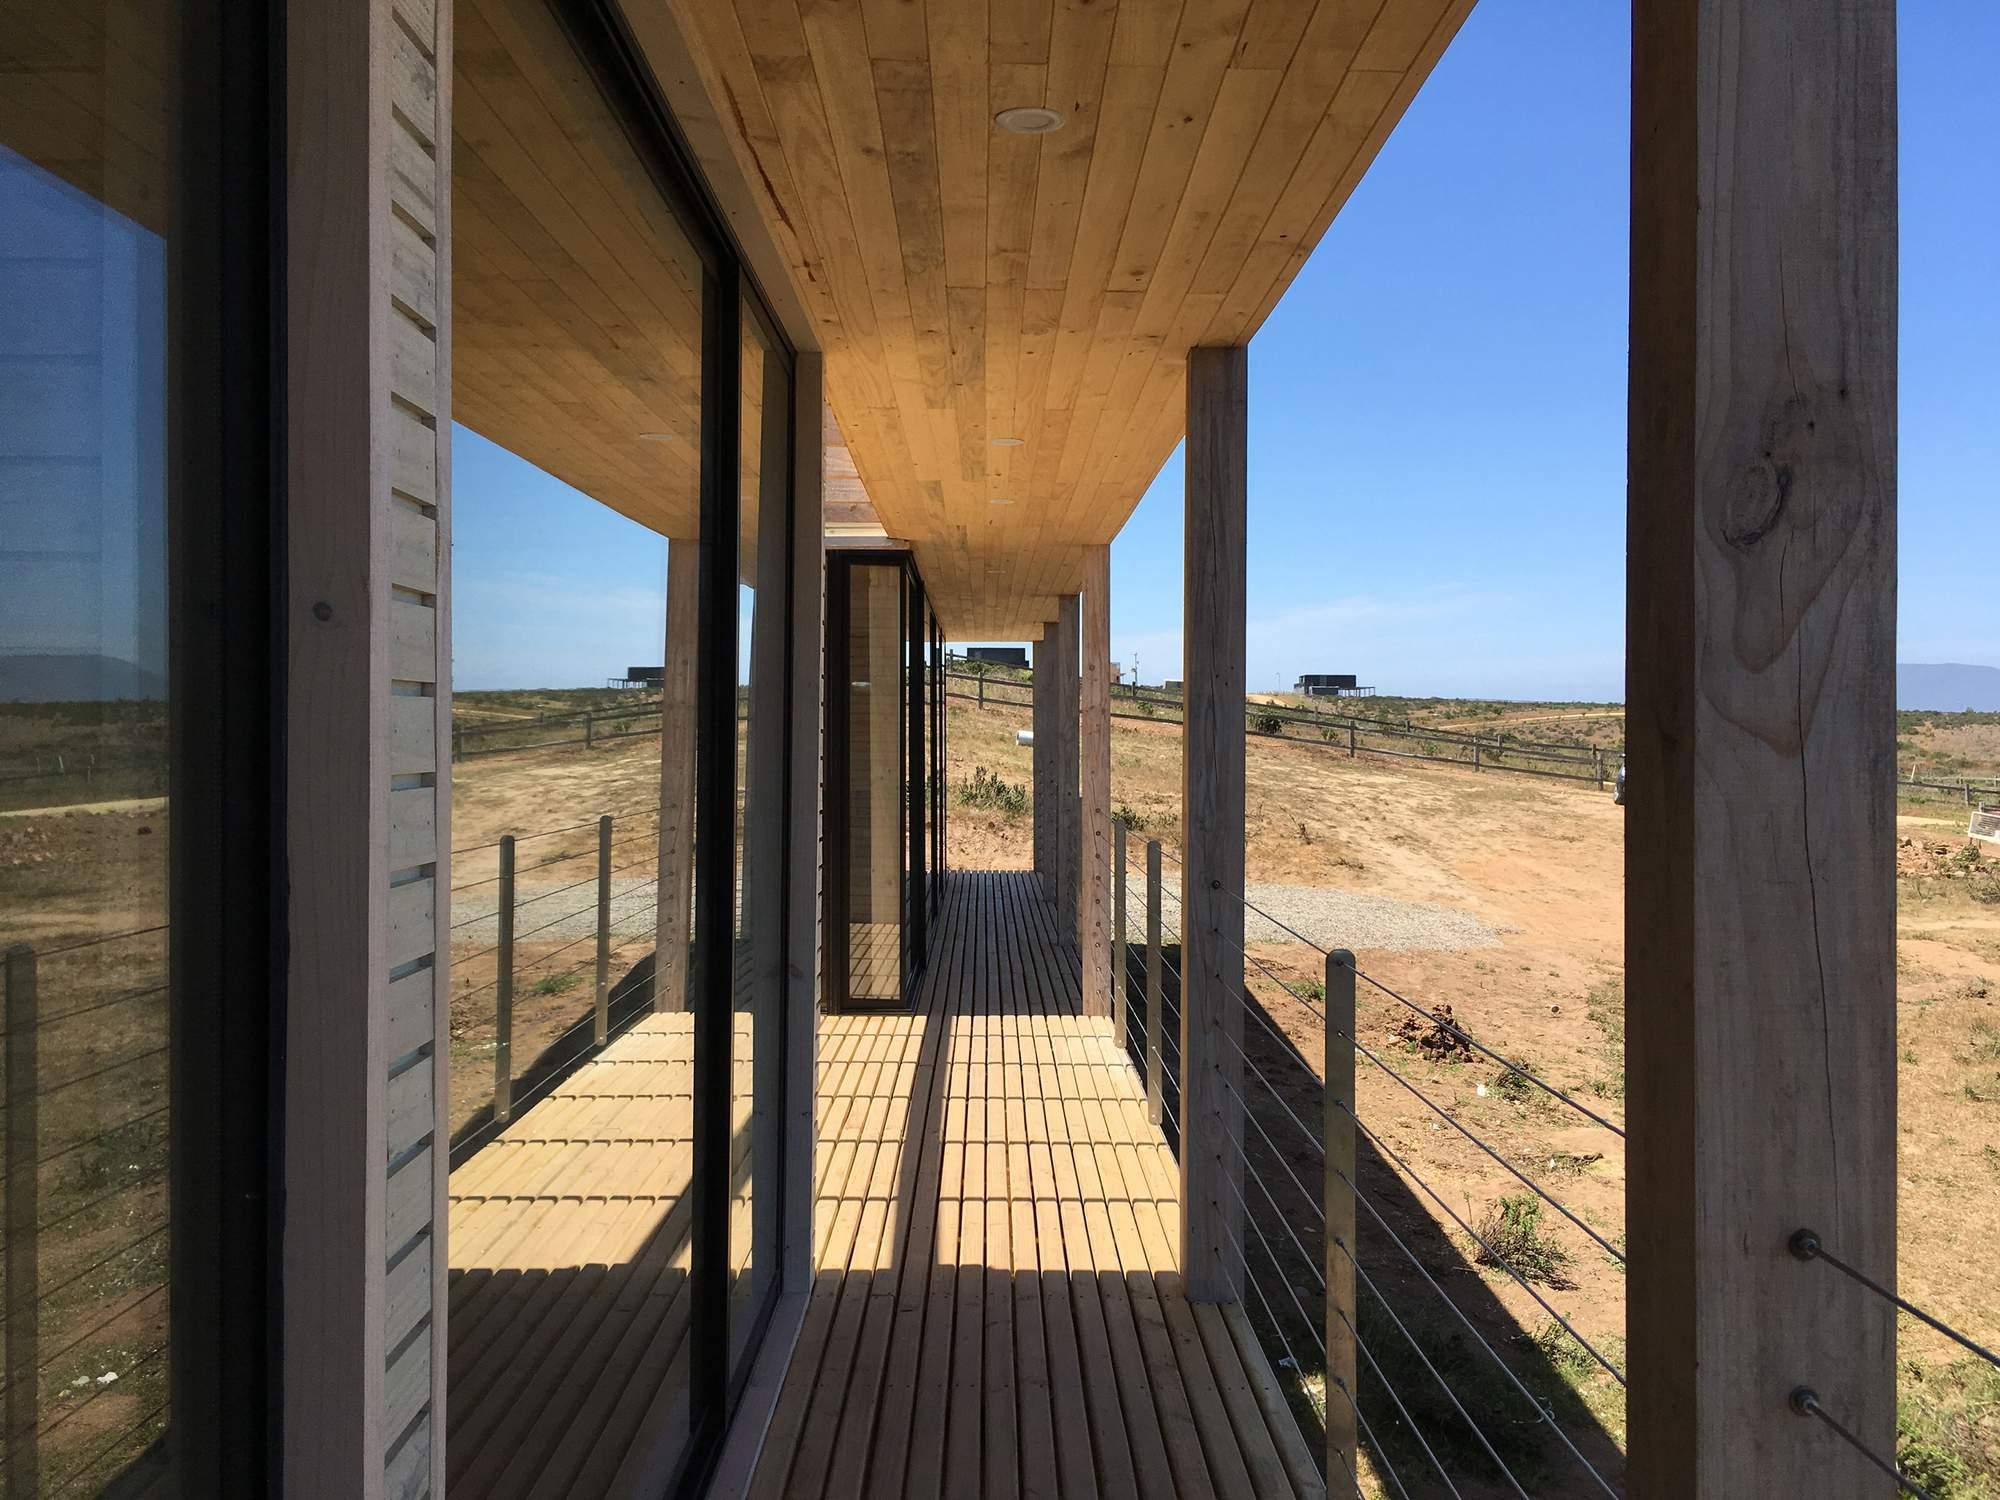 Дом-причал на берегу Тихого океана, Чили